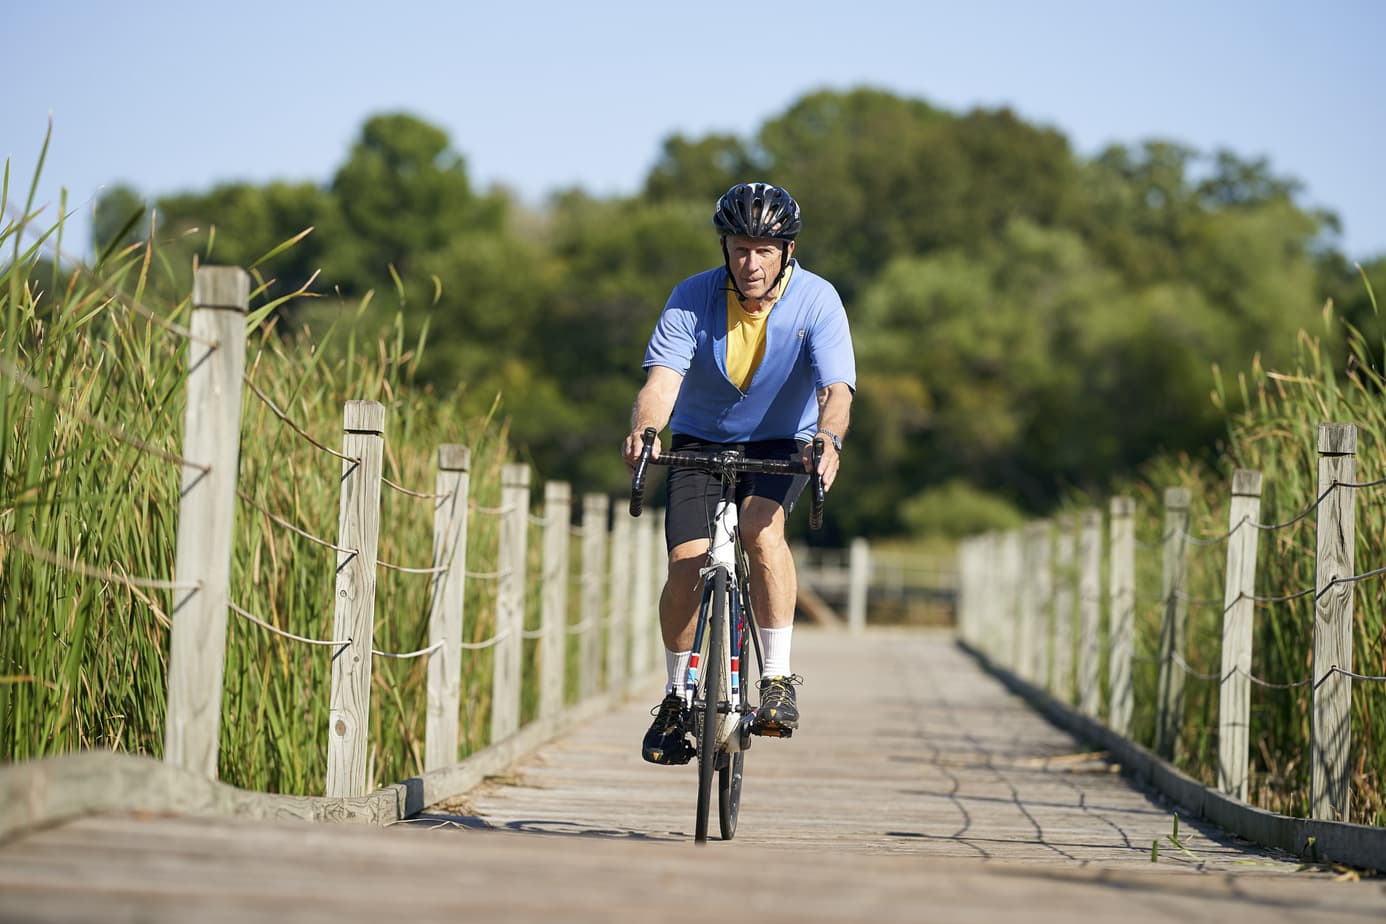 Retirement community photography. Active seniors, man riding bike